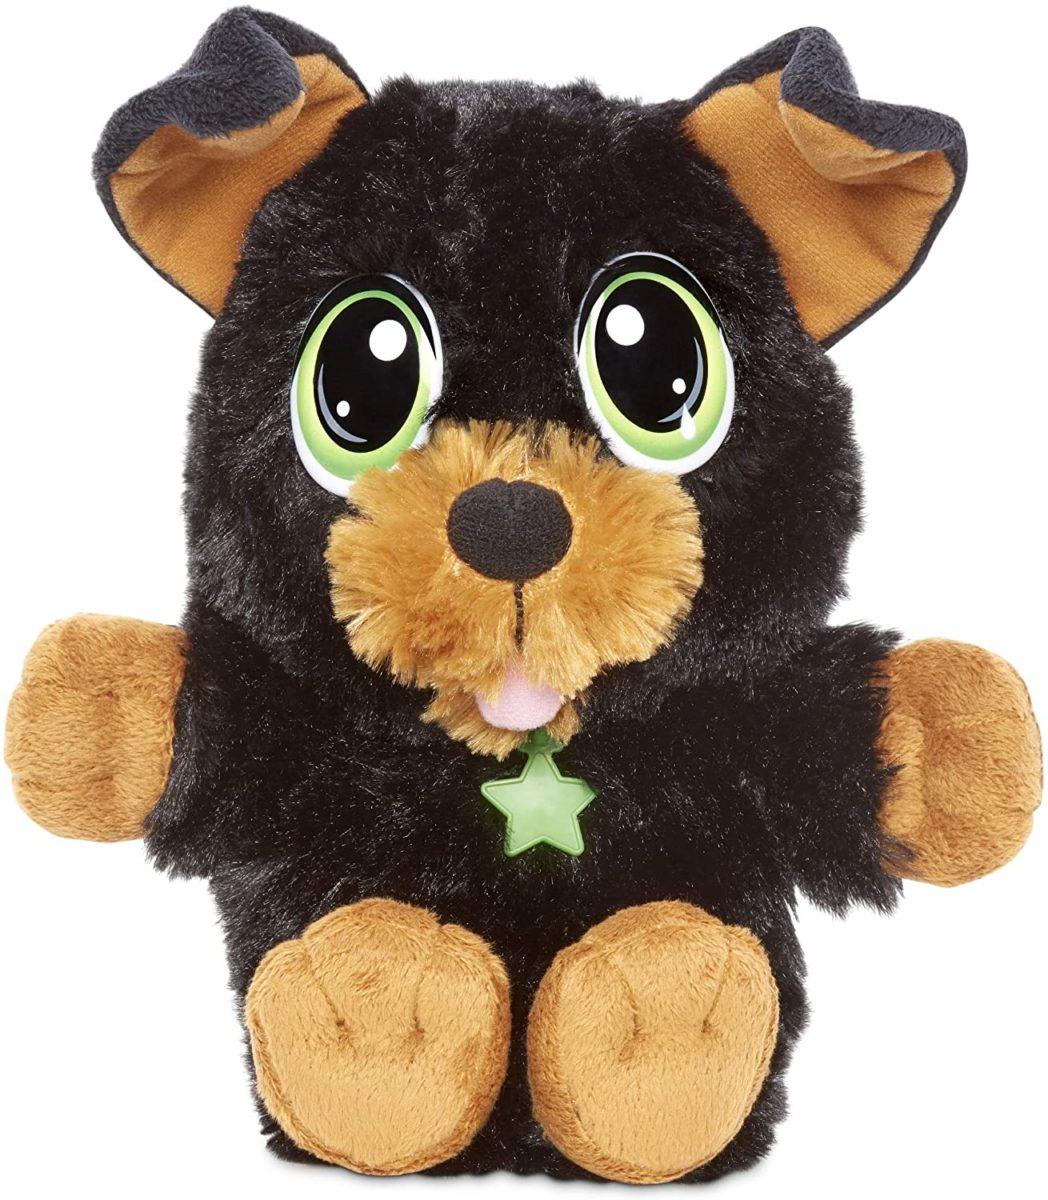 Little Tikes Rescue Tales Cuddly Pup Soft Plush Pet Toy - Amazon